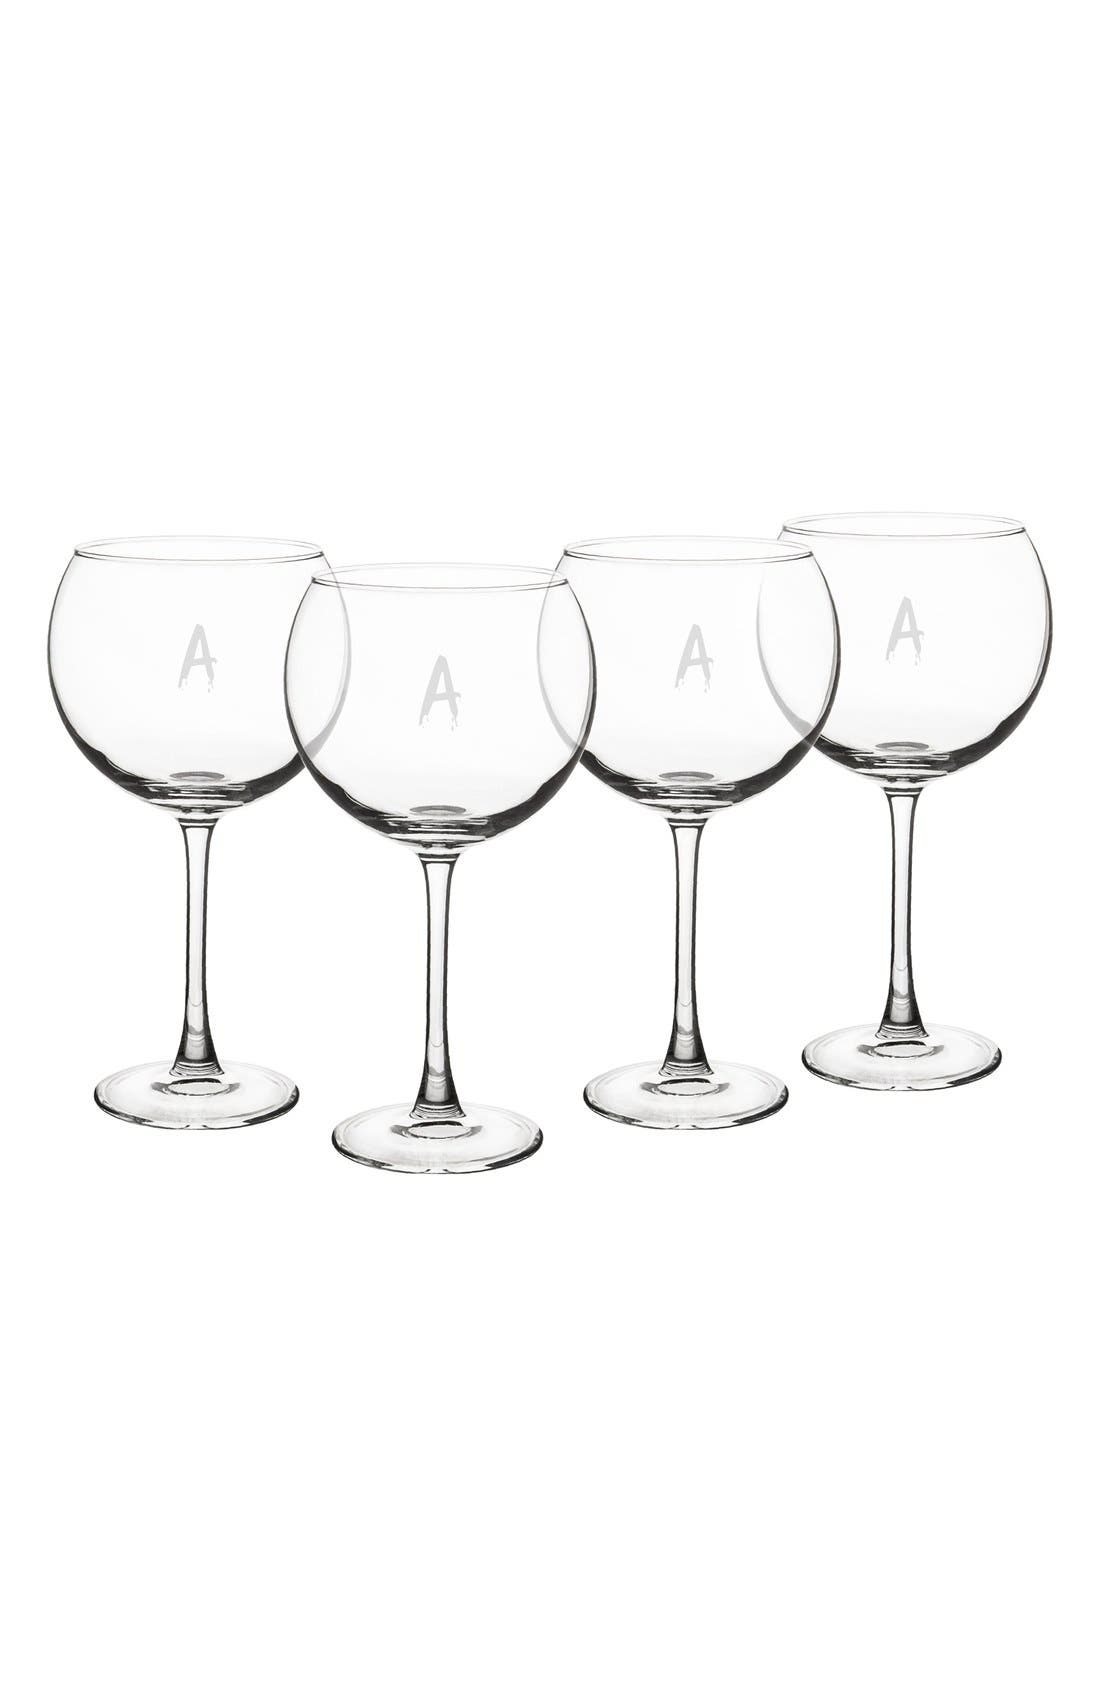 Spooky Monogram Set of 4 Red Wine Glasses,                             Main thumbnail 1, color,                             100